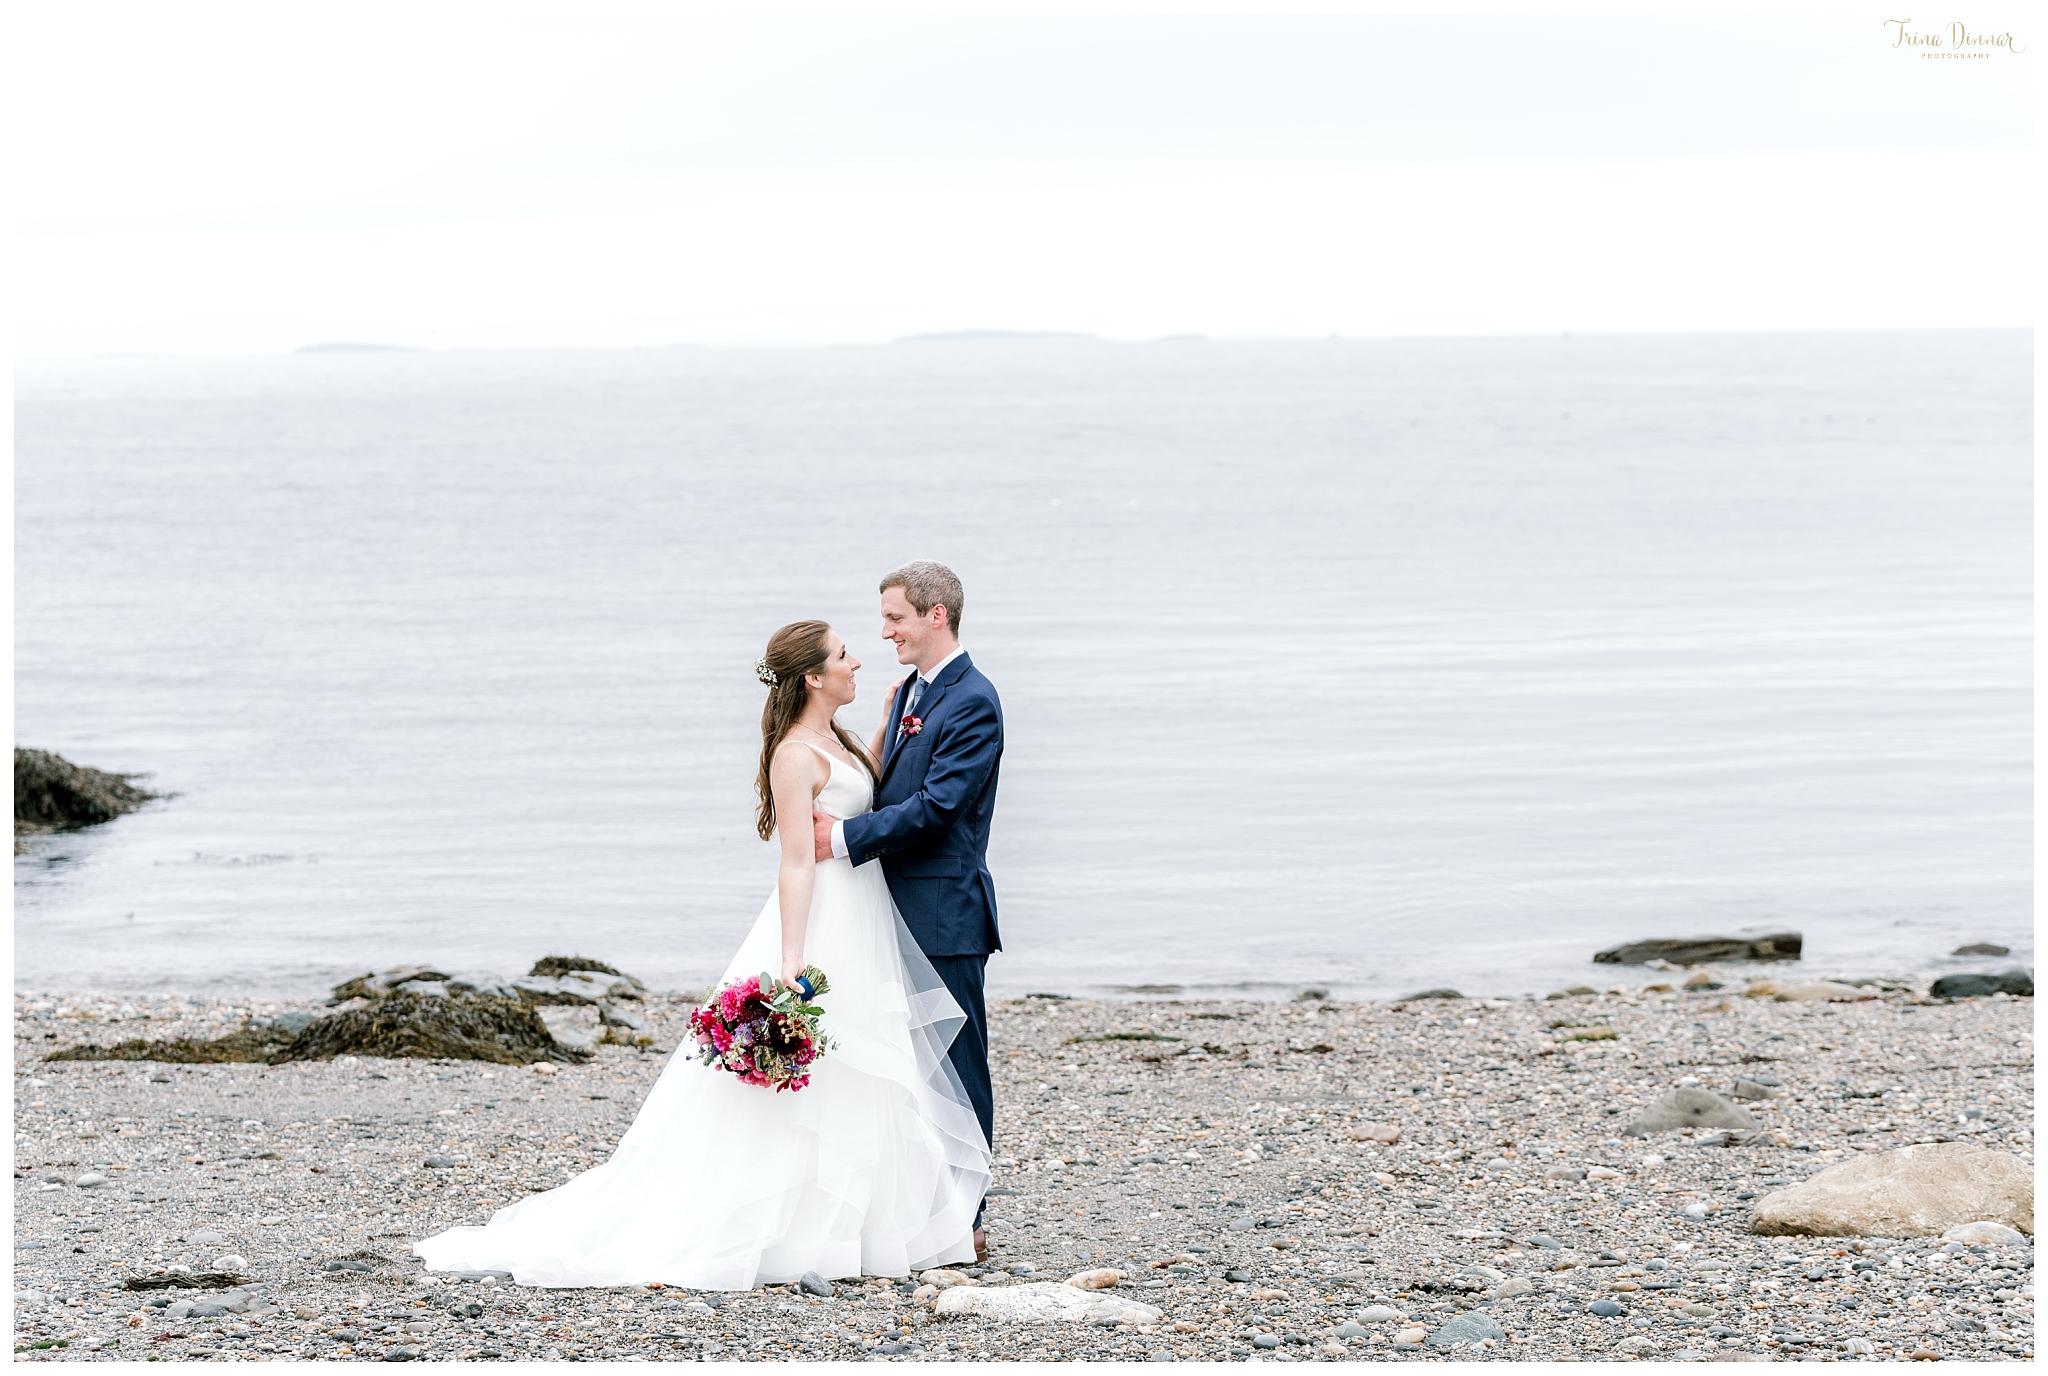 Maine Wedding by Trina Dinnar Photography